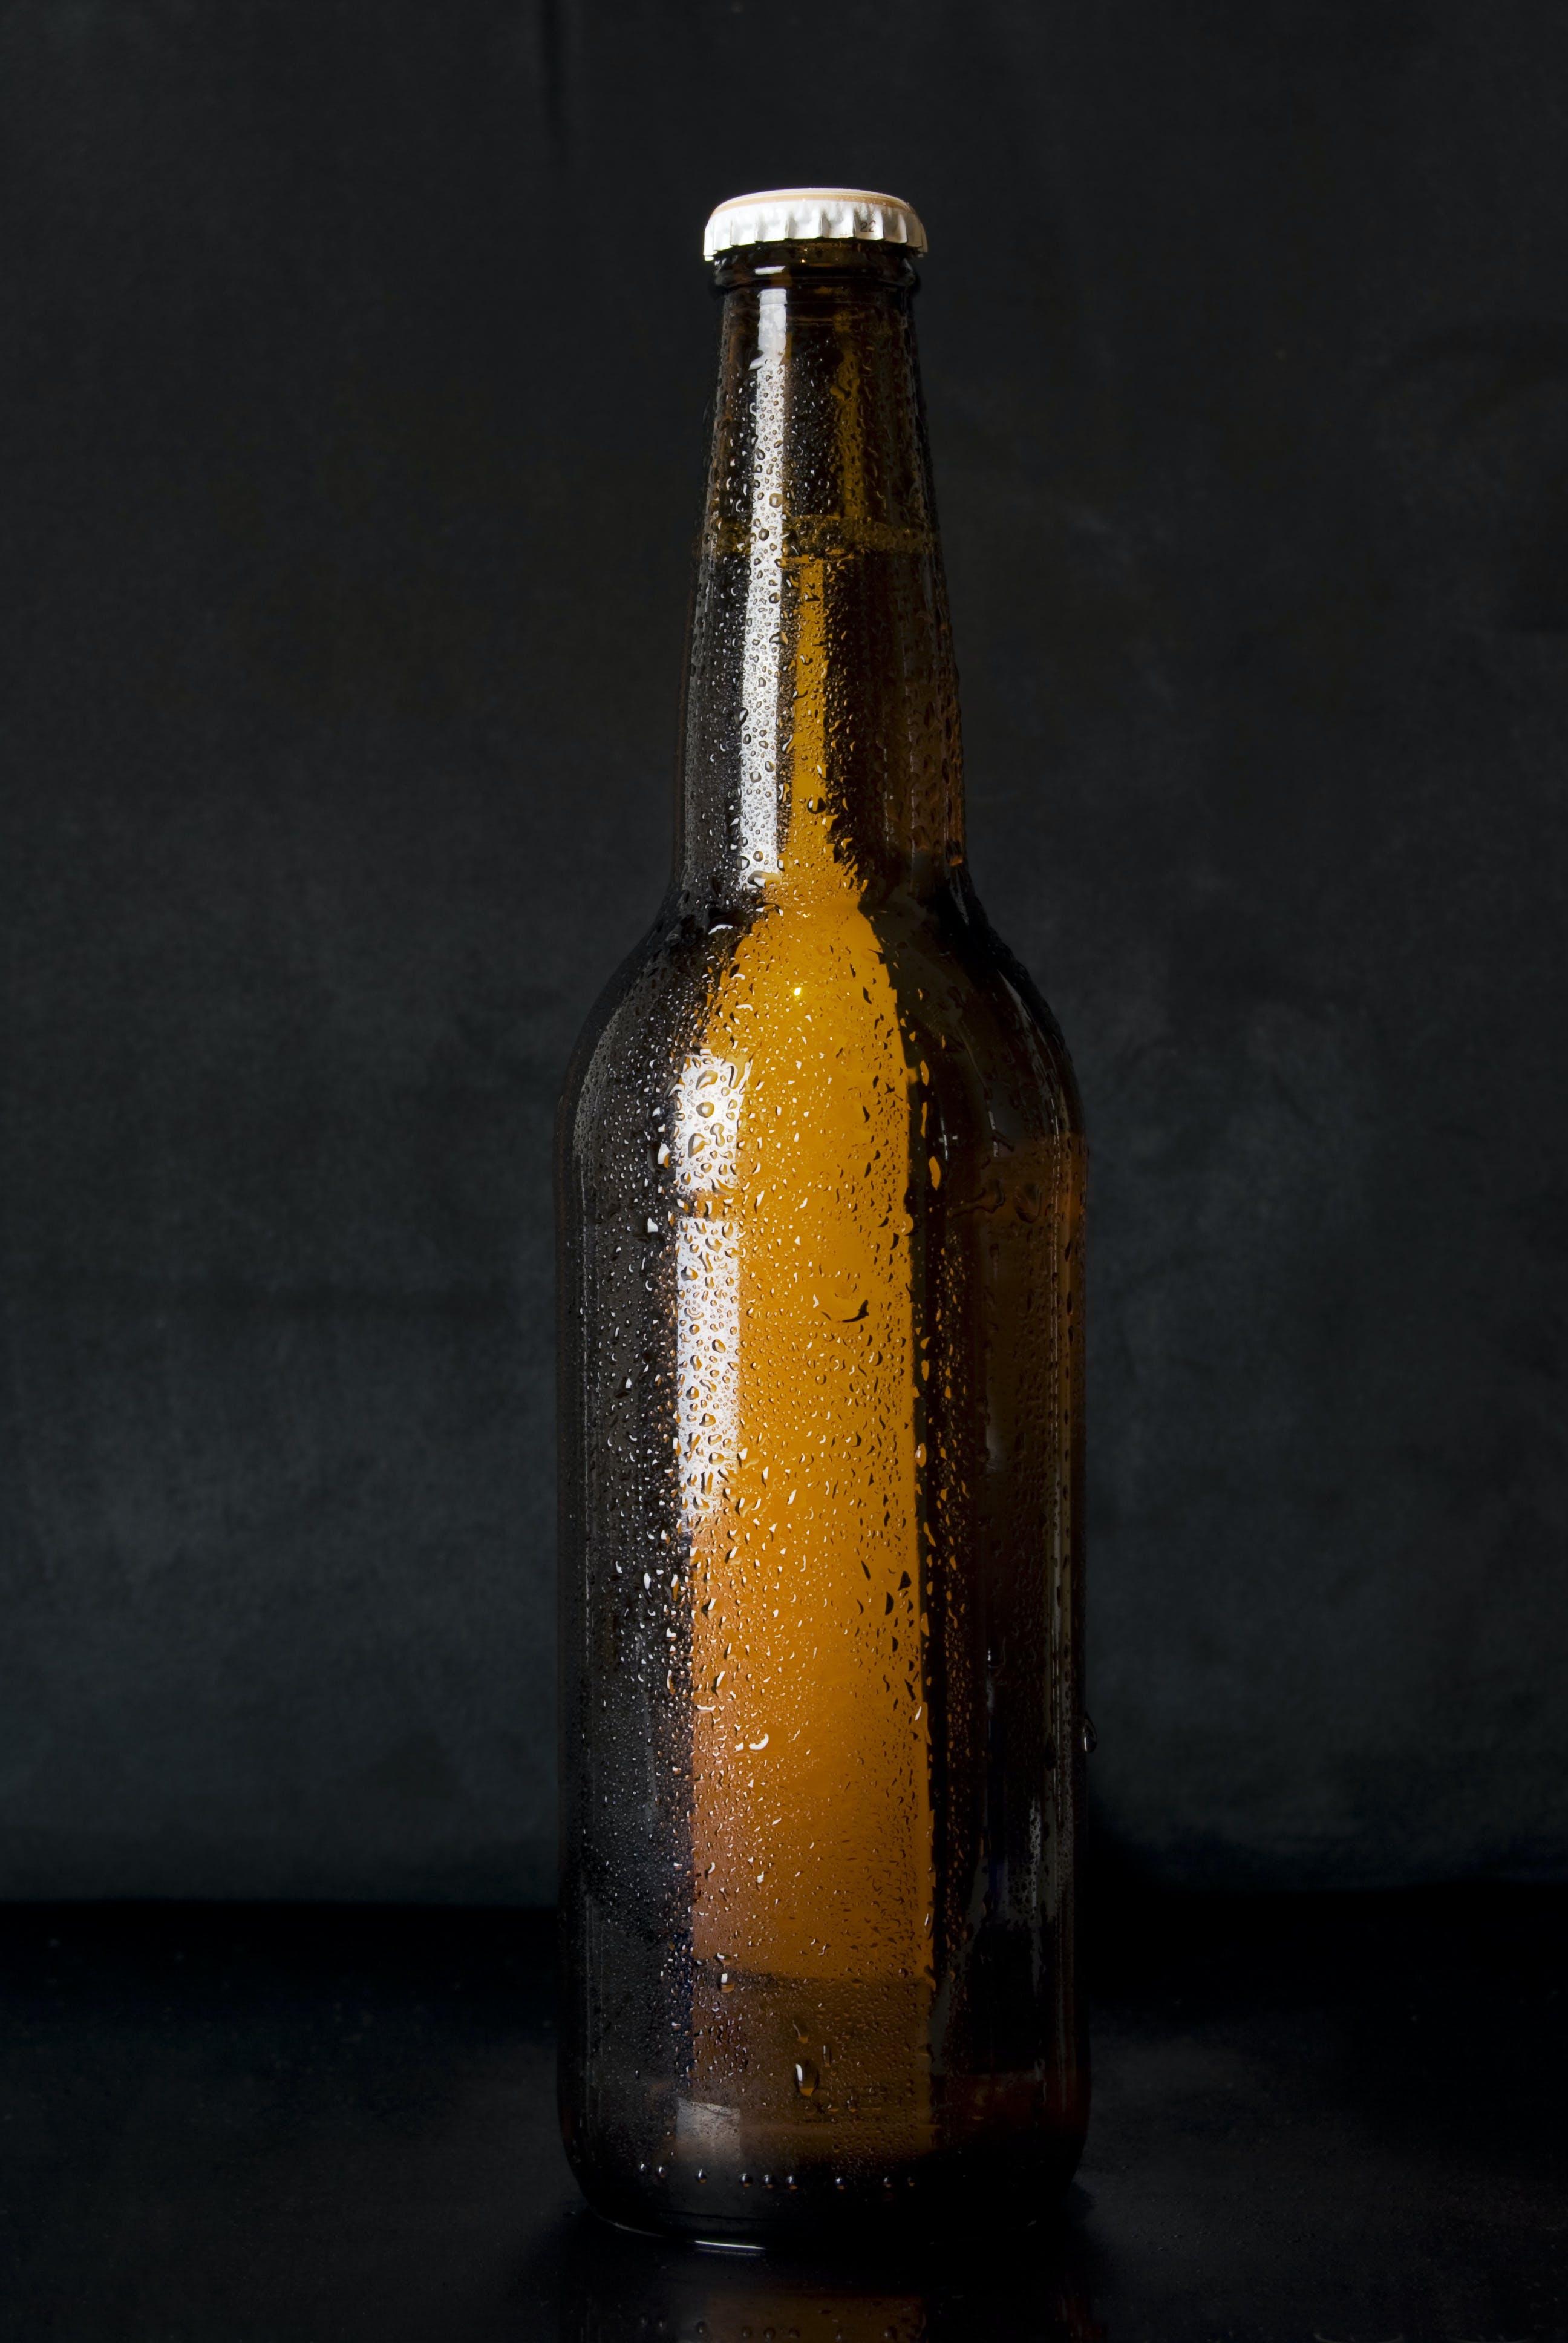 Amber Glass Bottle Standing on Black Surface